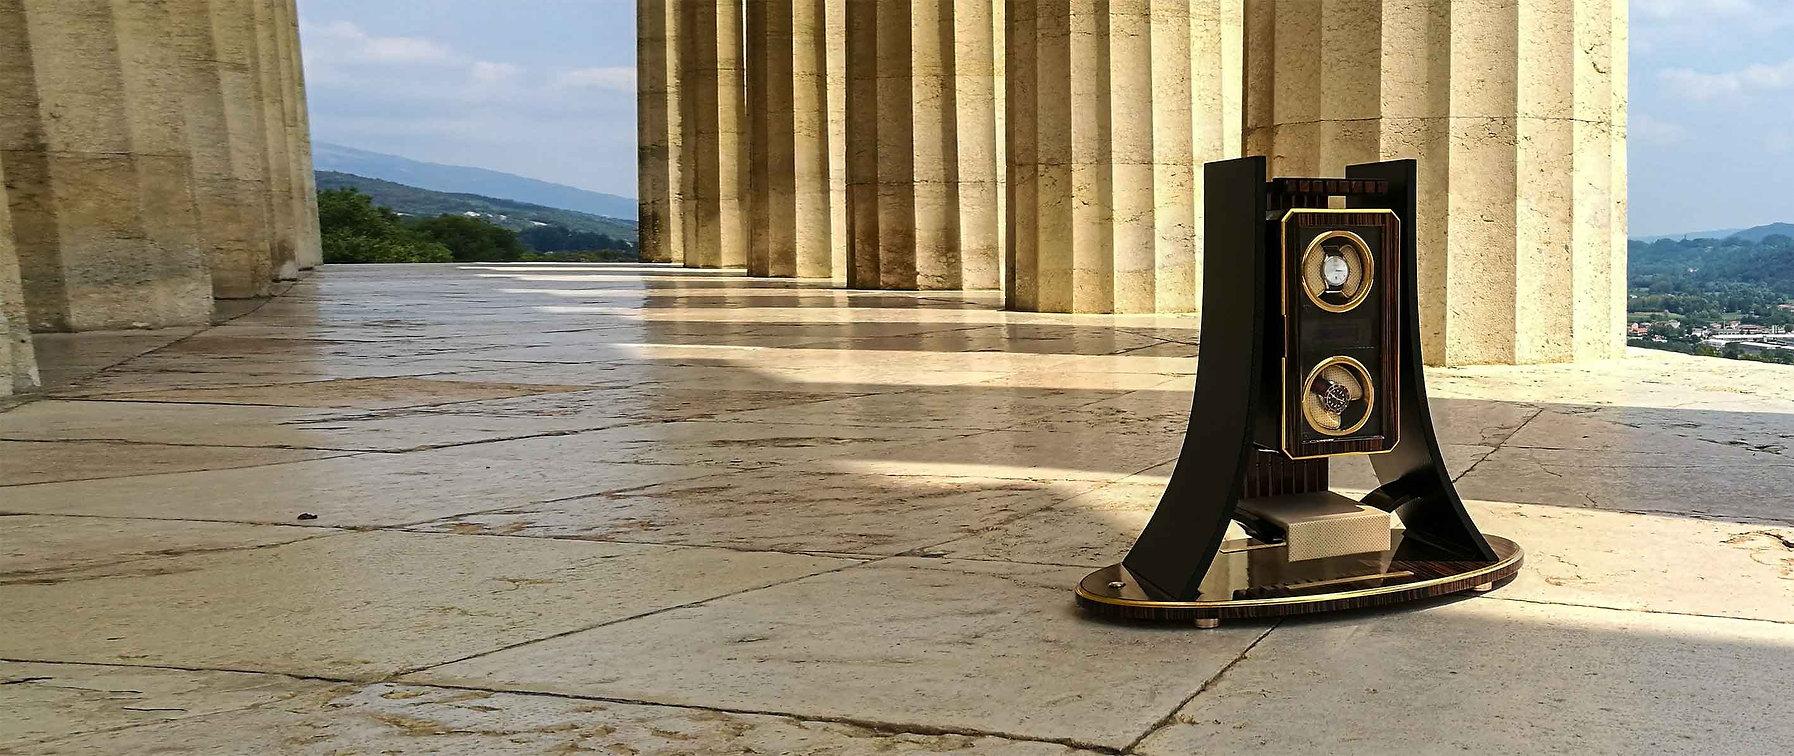 MT Eiffel Watch Winder, photo in Possagno, Italy. Watch Winder for Sale, watch winder Automatic, Watch Winder Luxury.  MT Eiffel Porta Orologio. Foto a Possagno, Italia.  Negozio porta orologio, porta orologio automatico, porta orologio lusso.